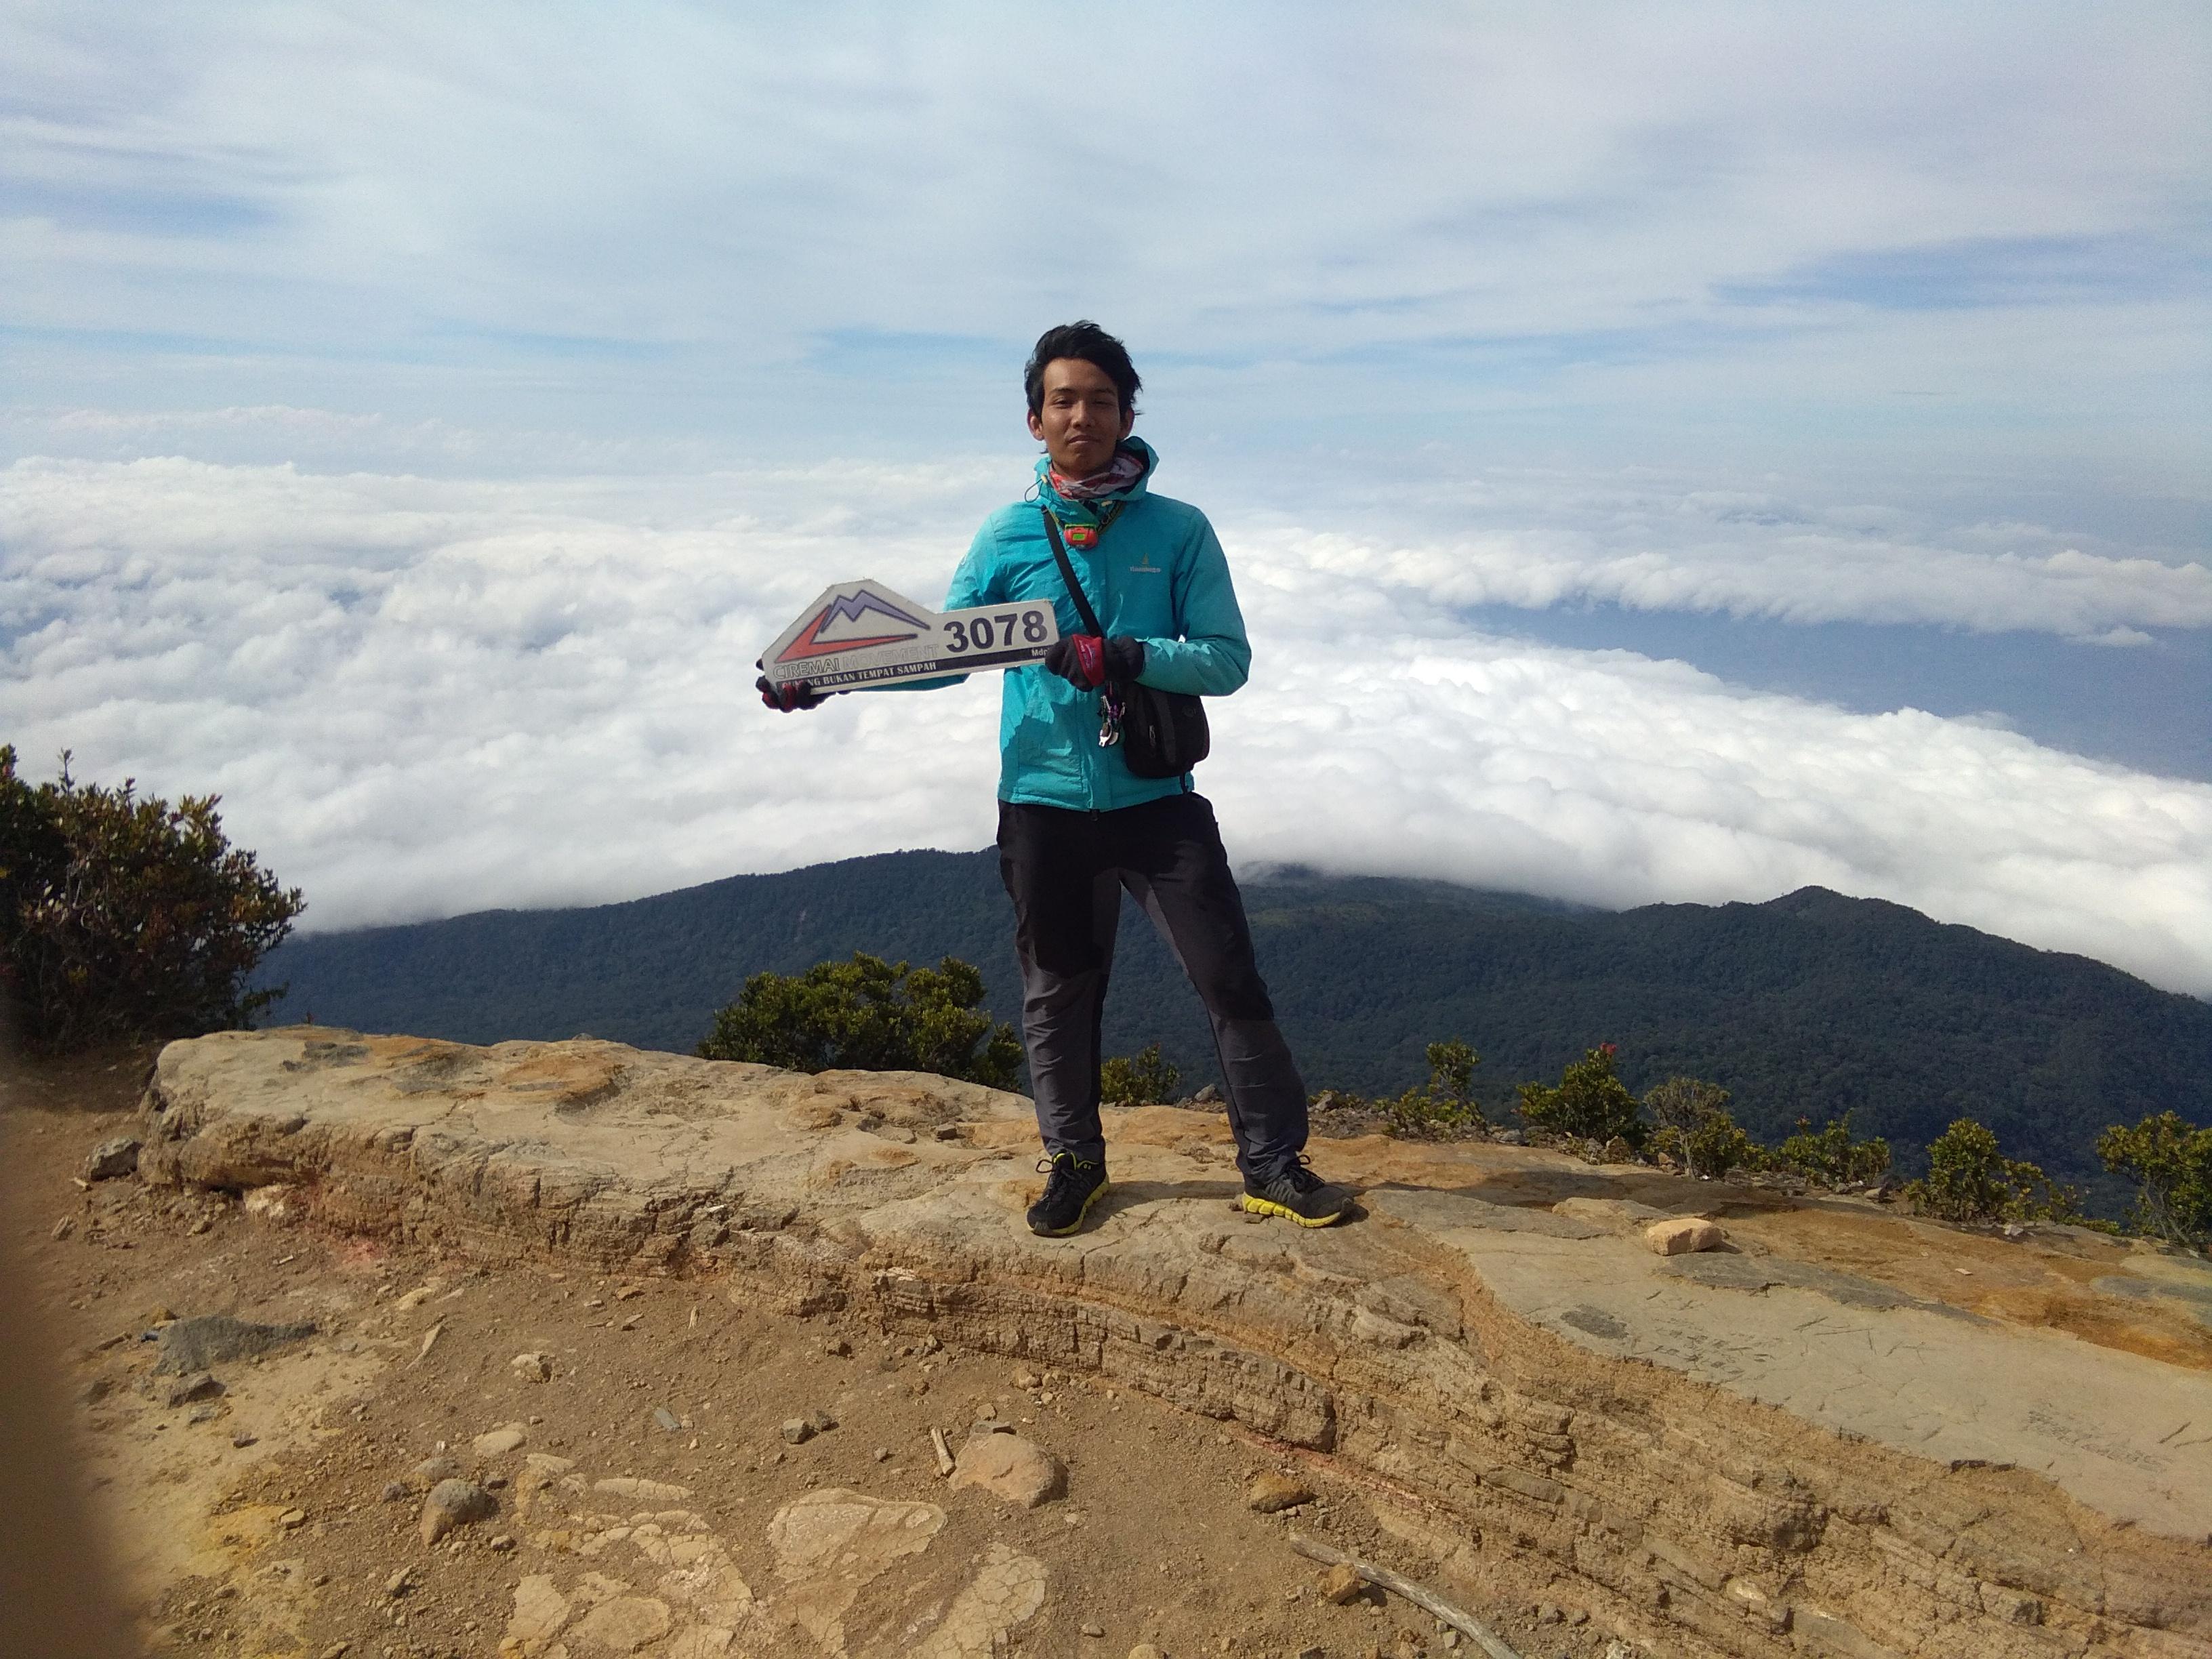 Di Puncak Gunung Ciremai 3078 mdpl (Foto oleh : Bagus)